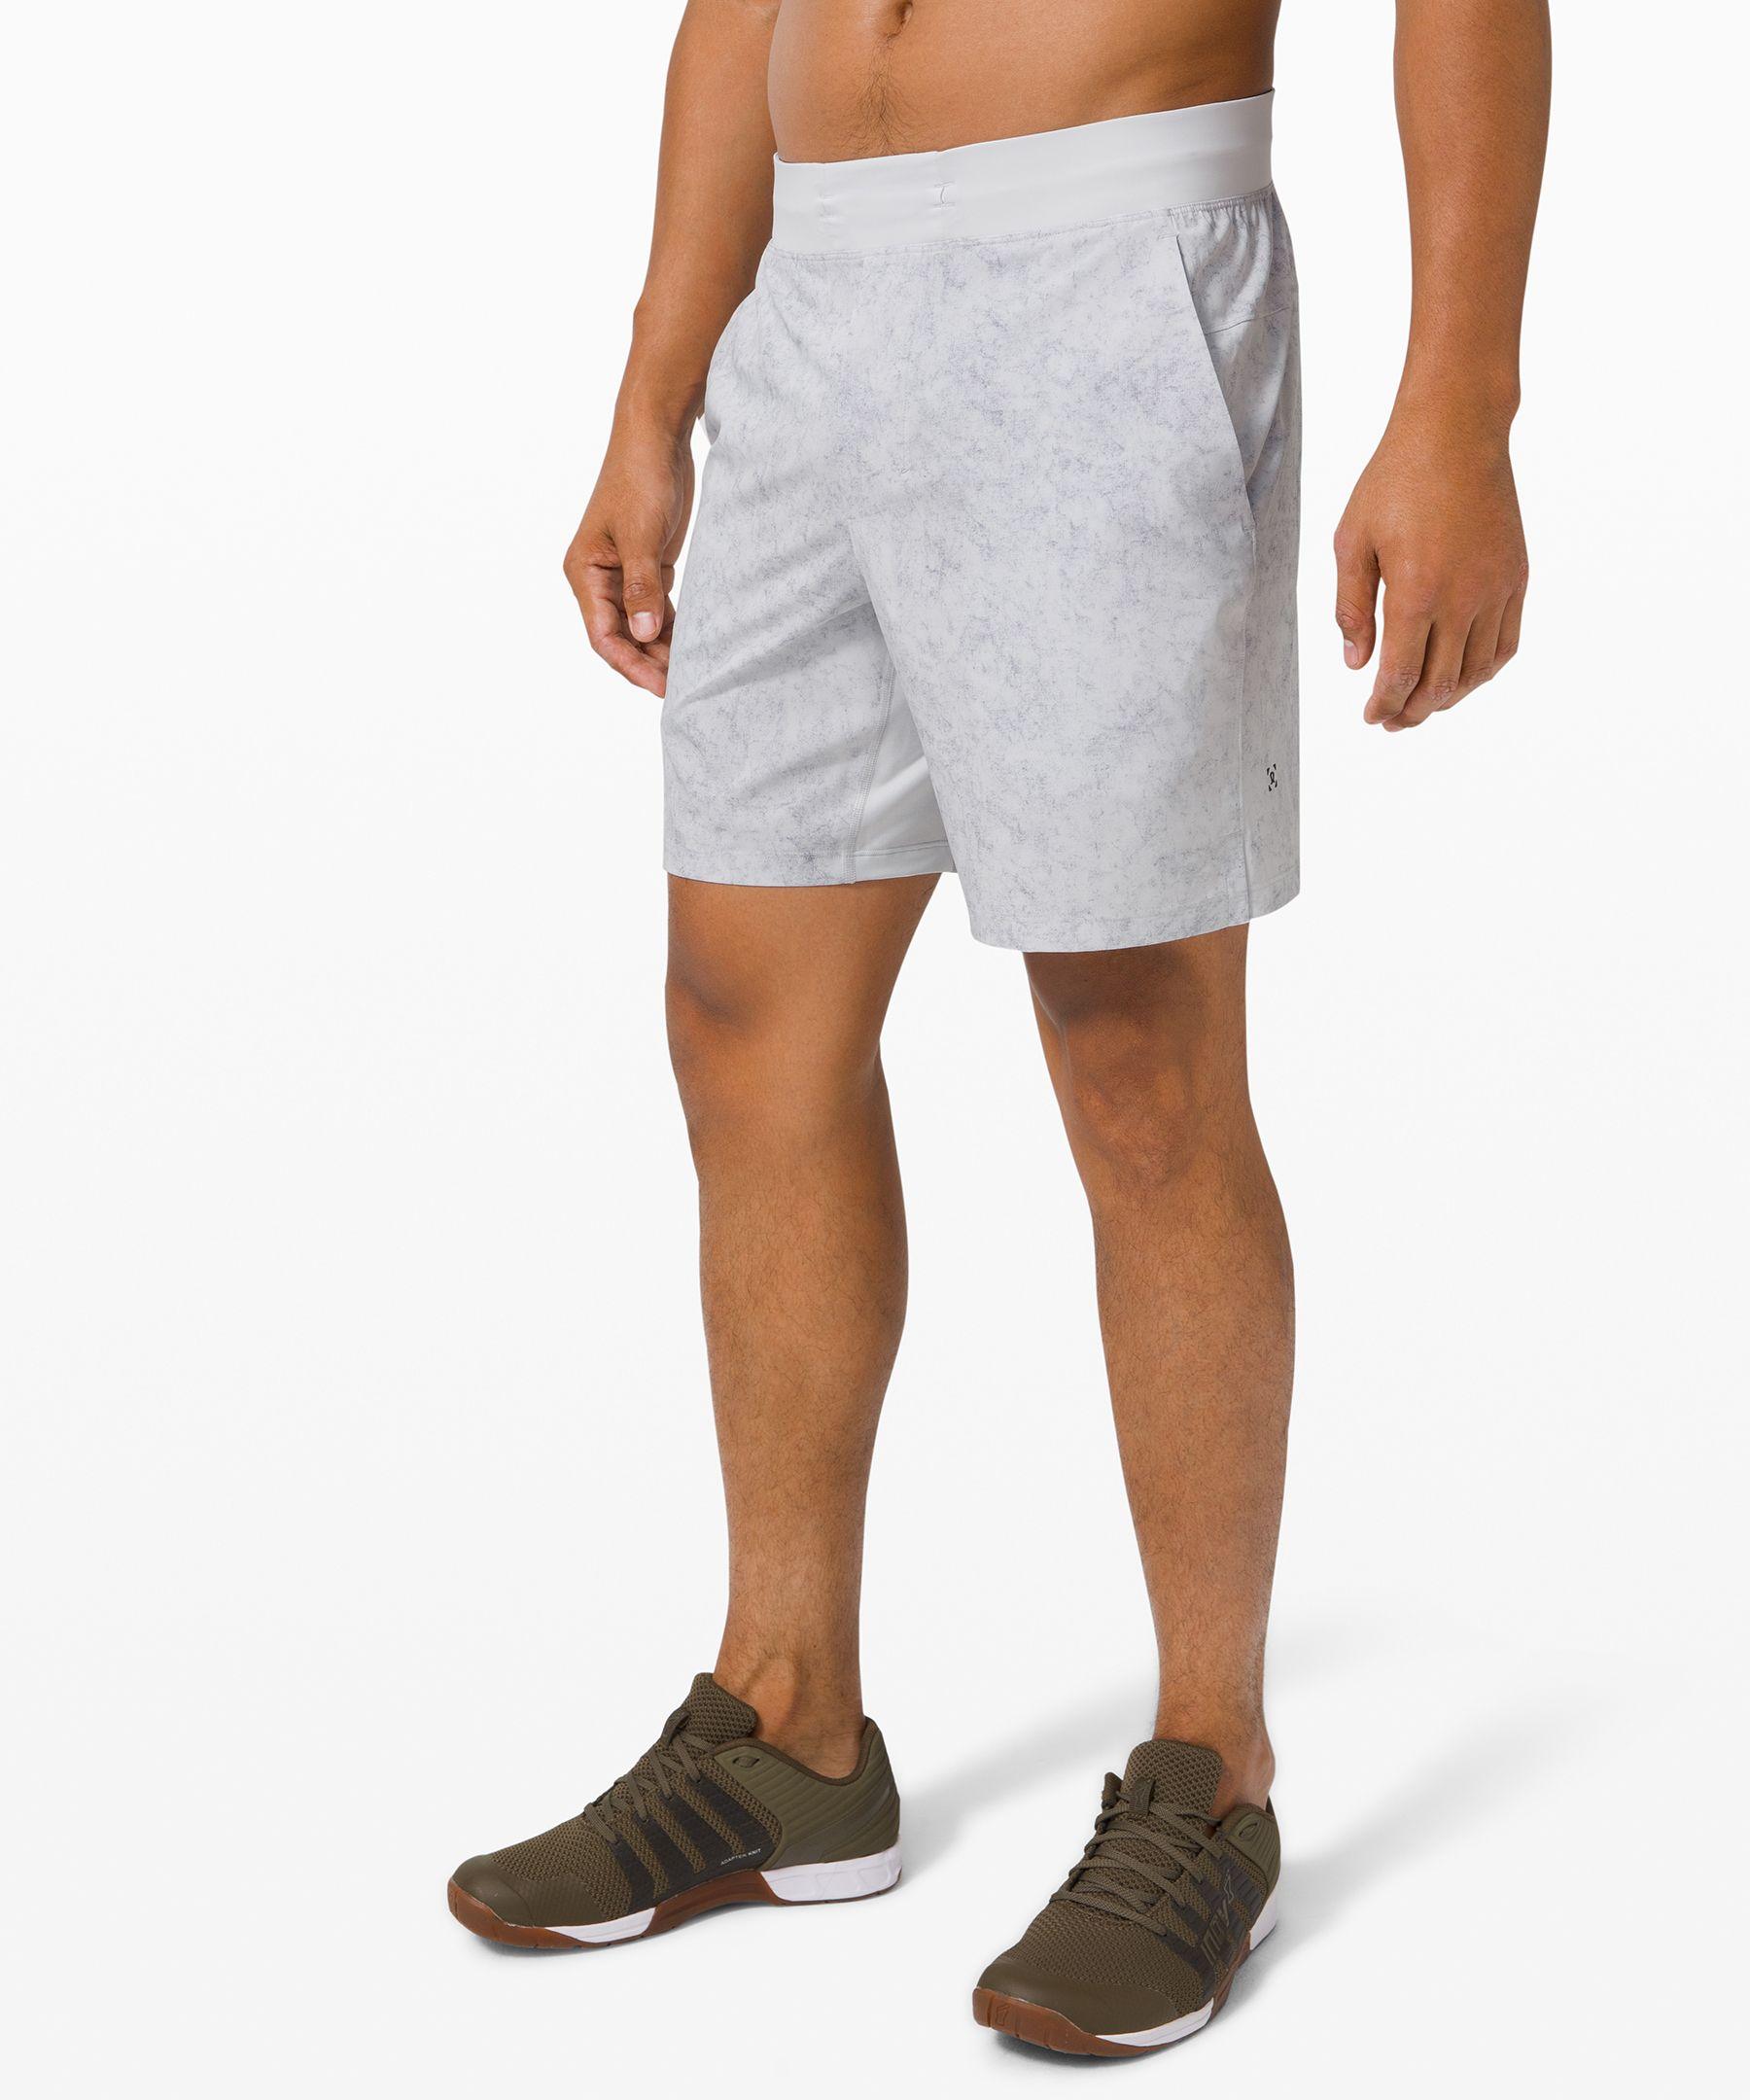 Sport Leichte Run Shorts